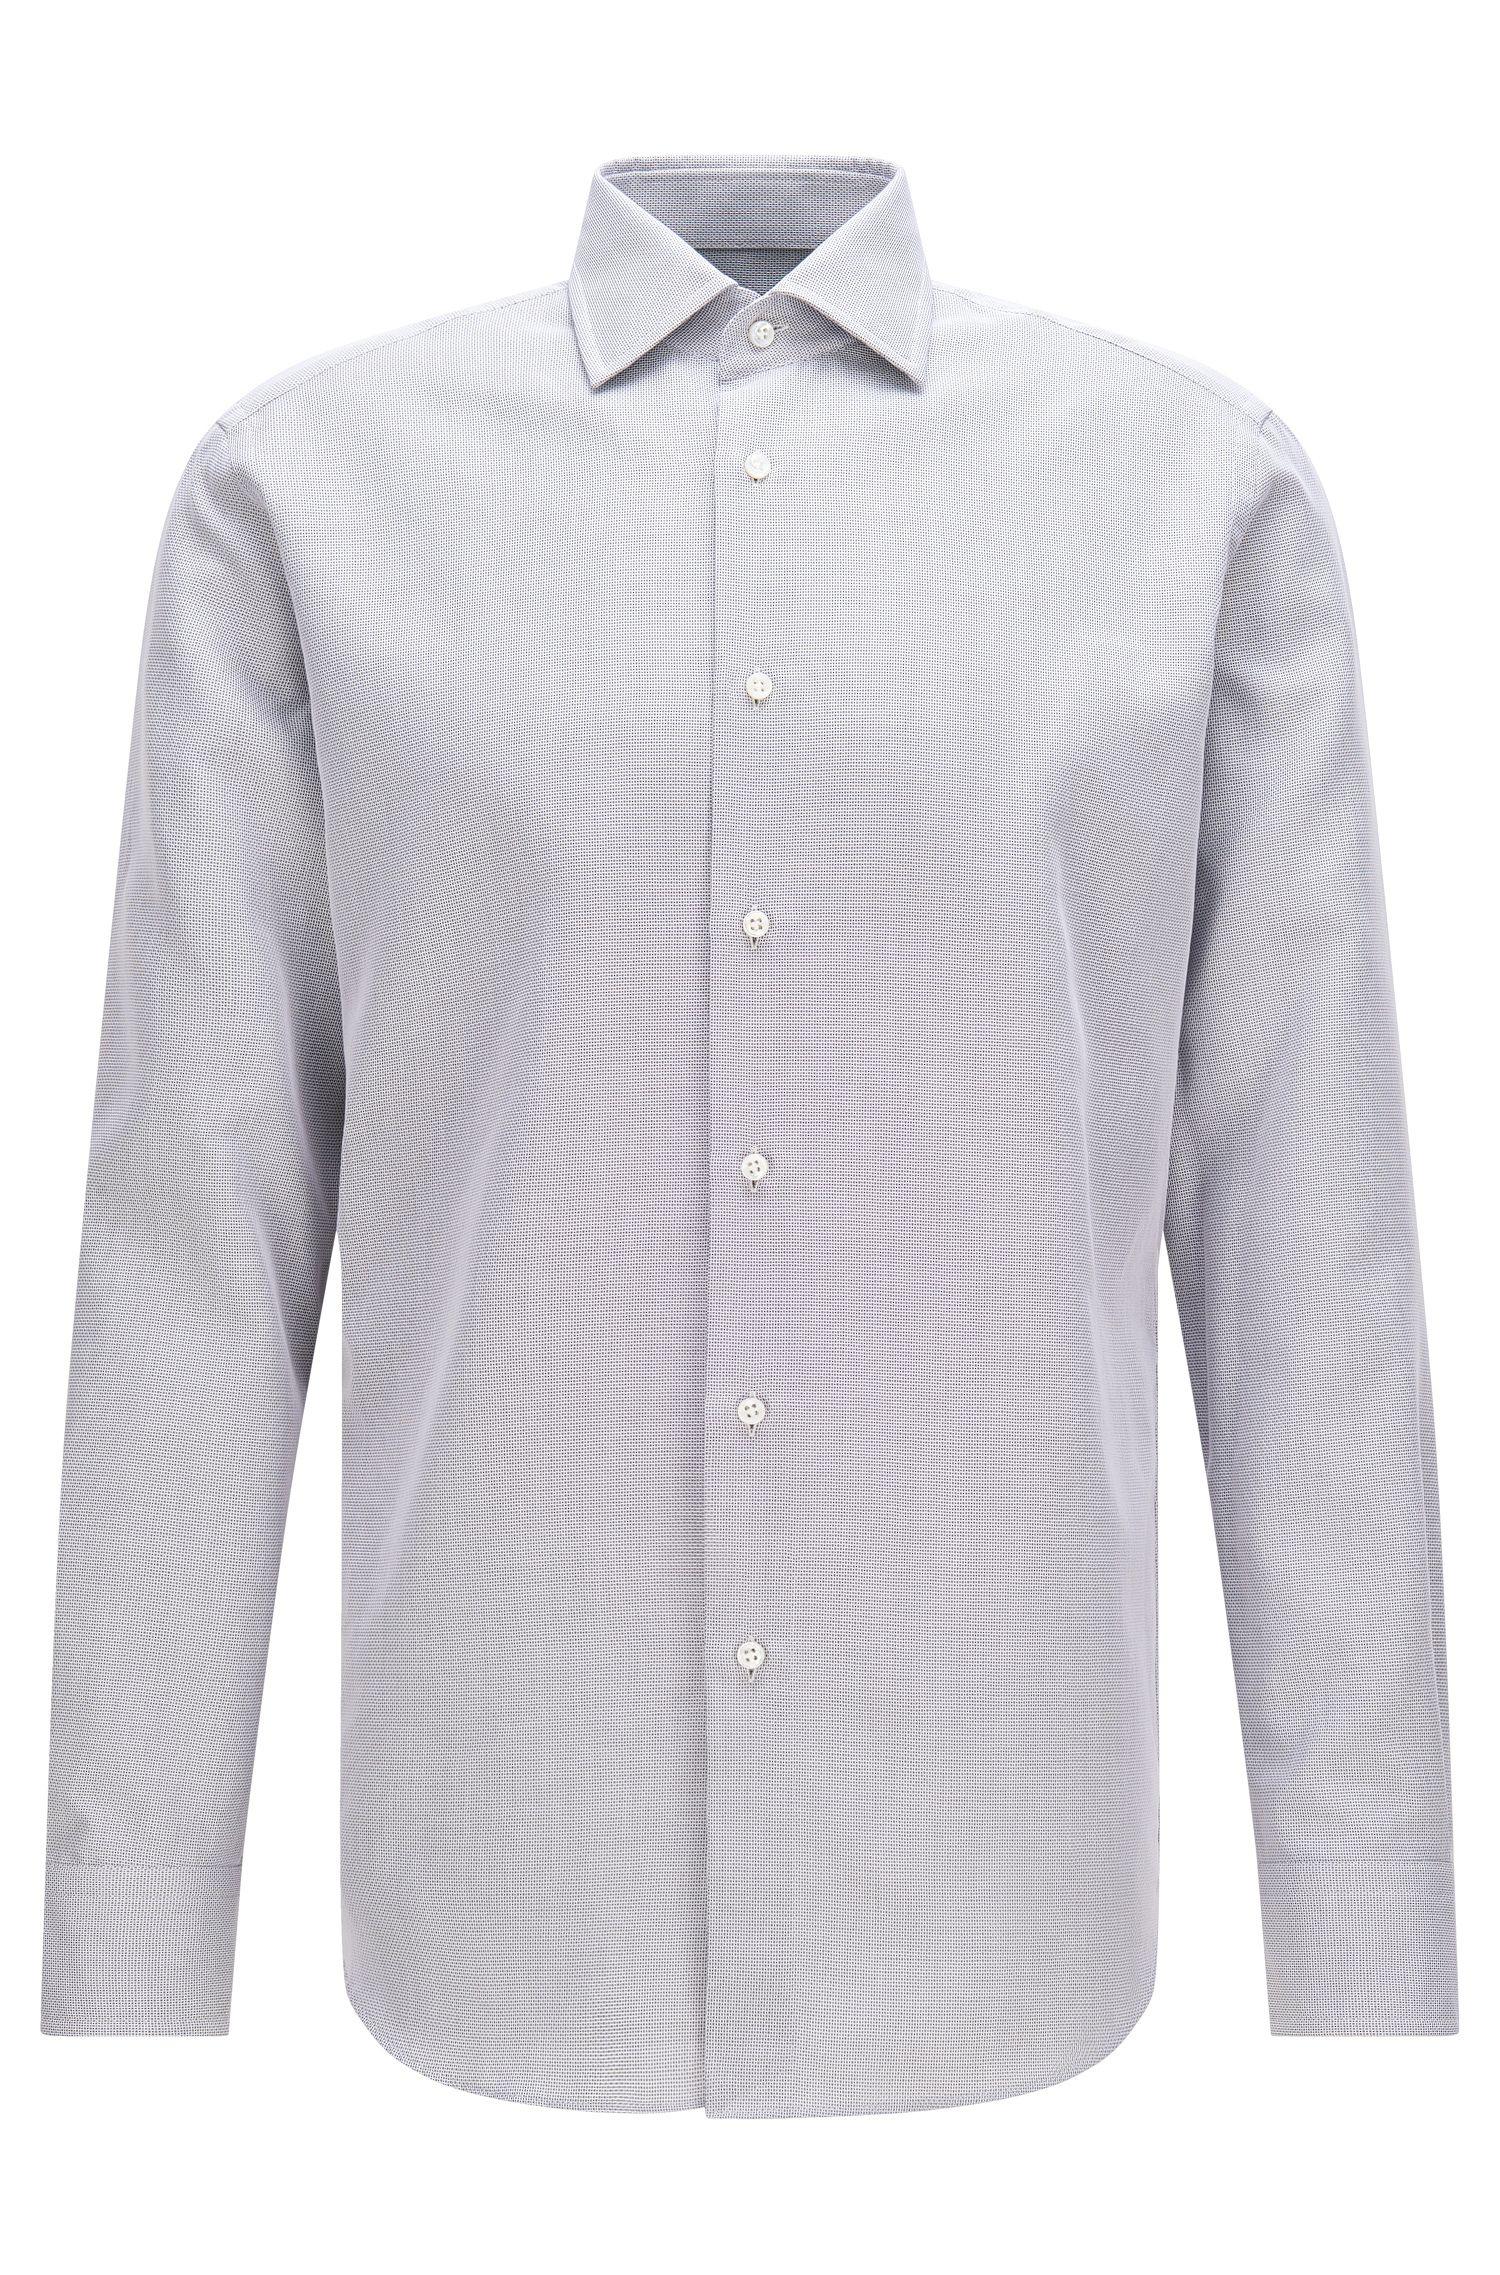 End-on-End Cotton Dress Shirt, Regular Fit | T-Stuart